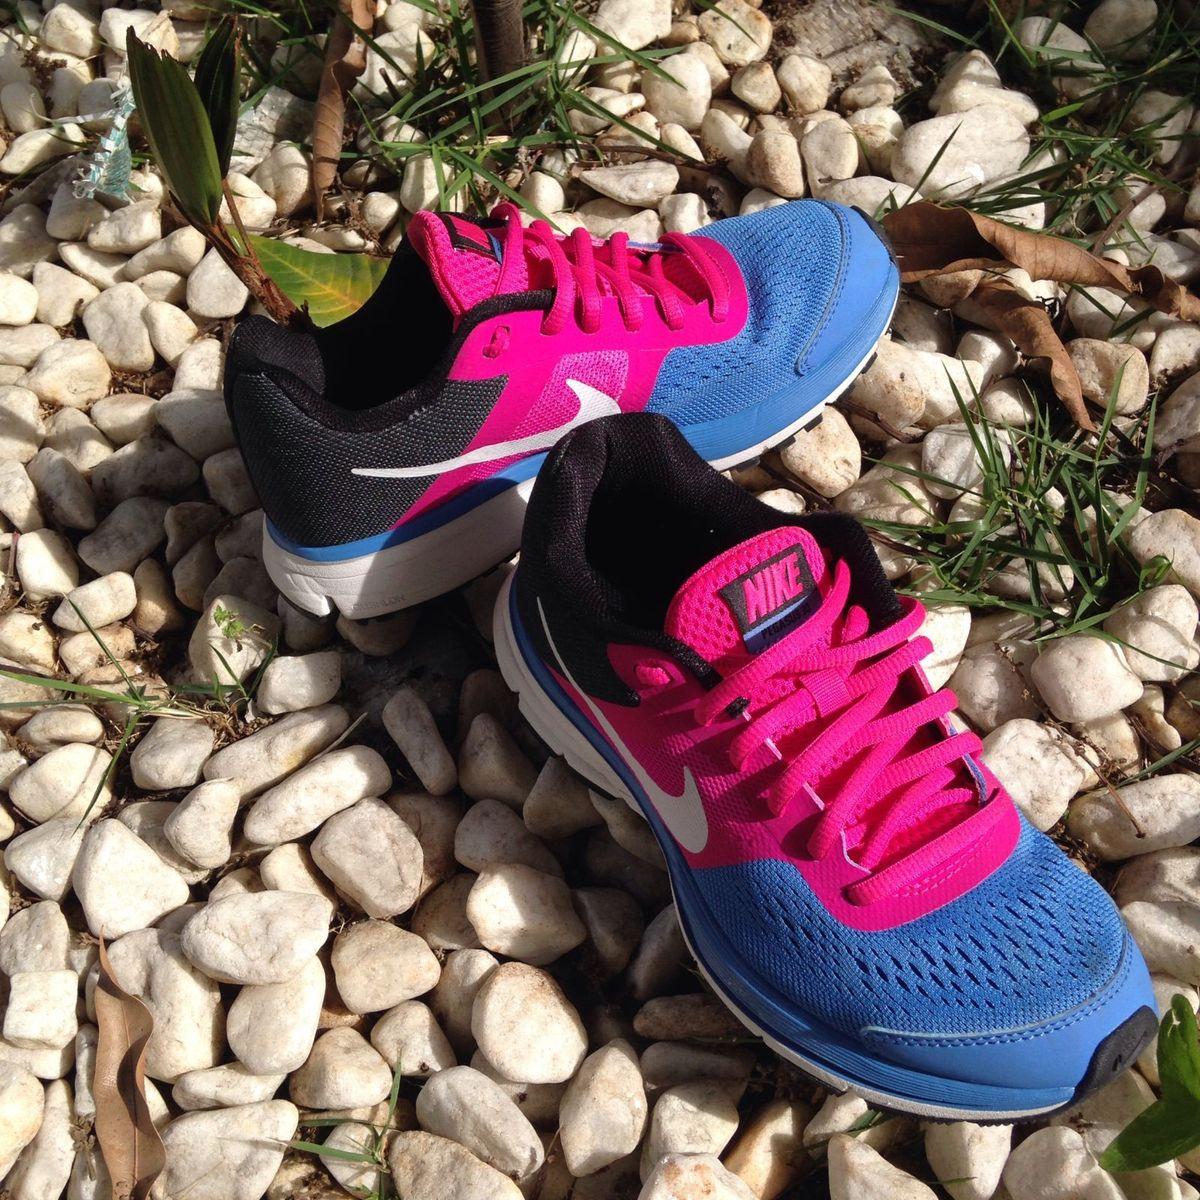 rechazo Descripción del negocio Padre fage  Nike Pegasus 30 | Tênis Feminino Nike Usado 12791625 | enjoei